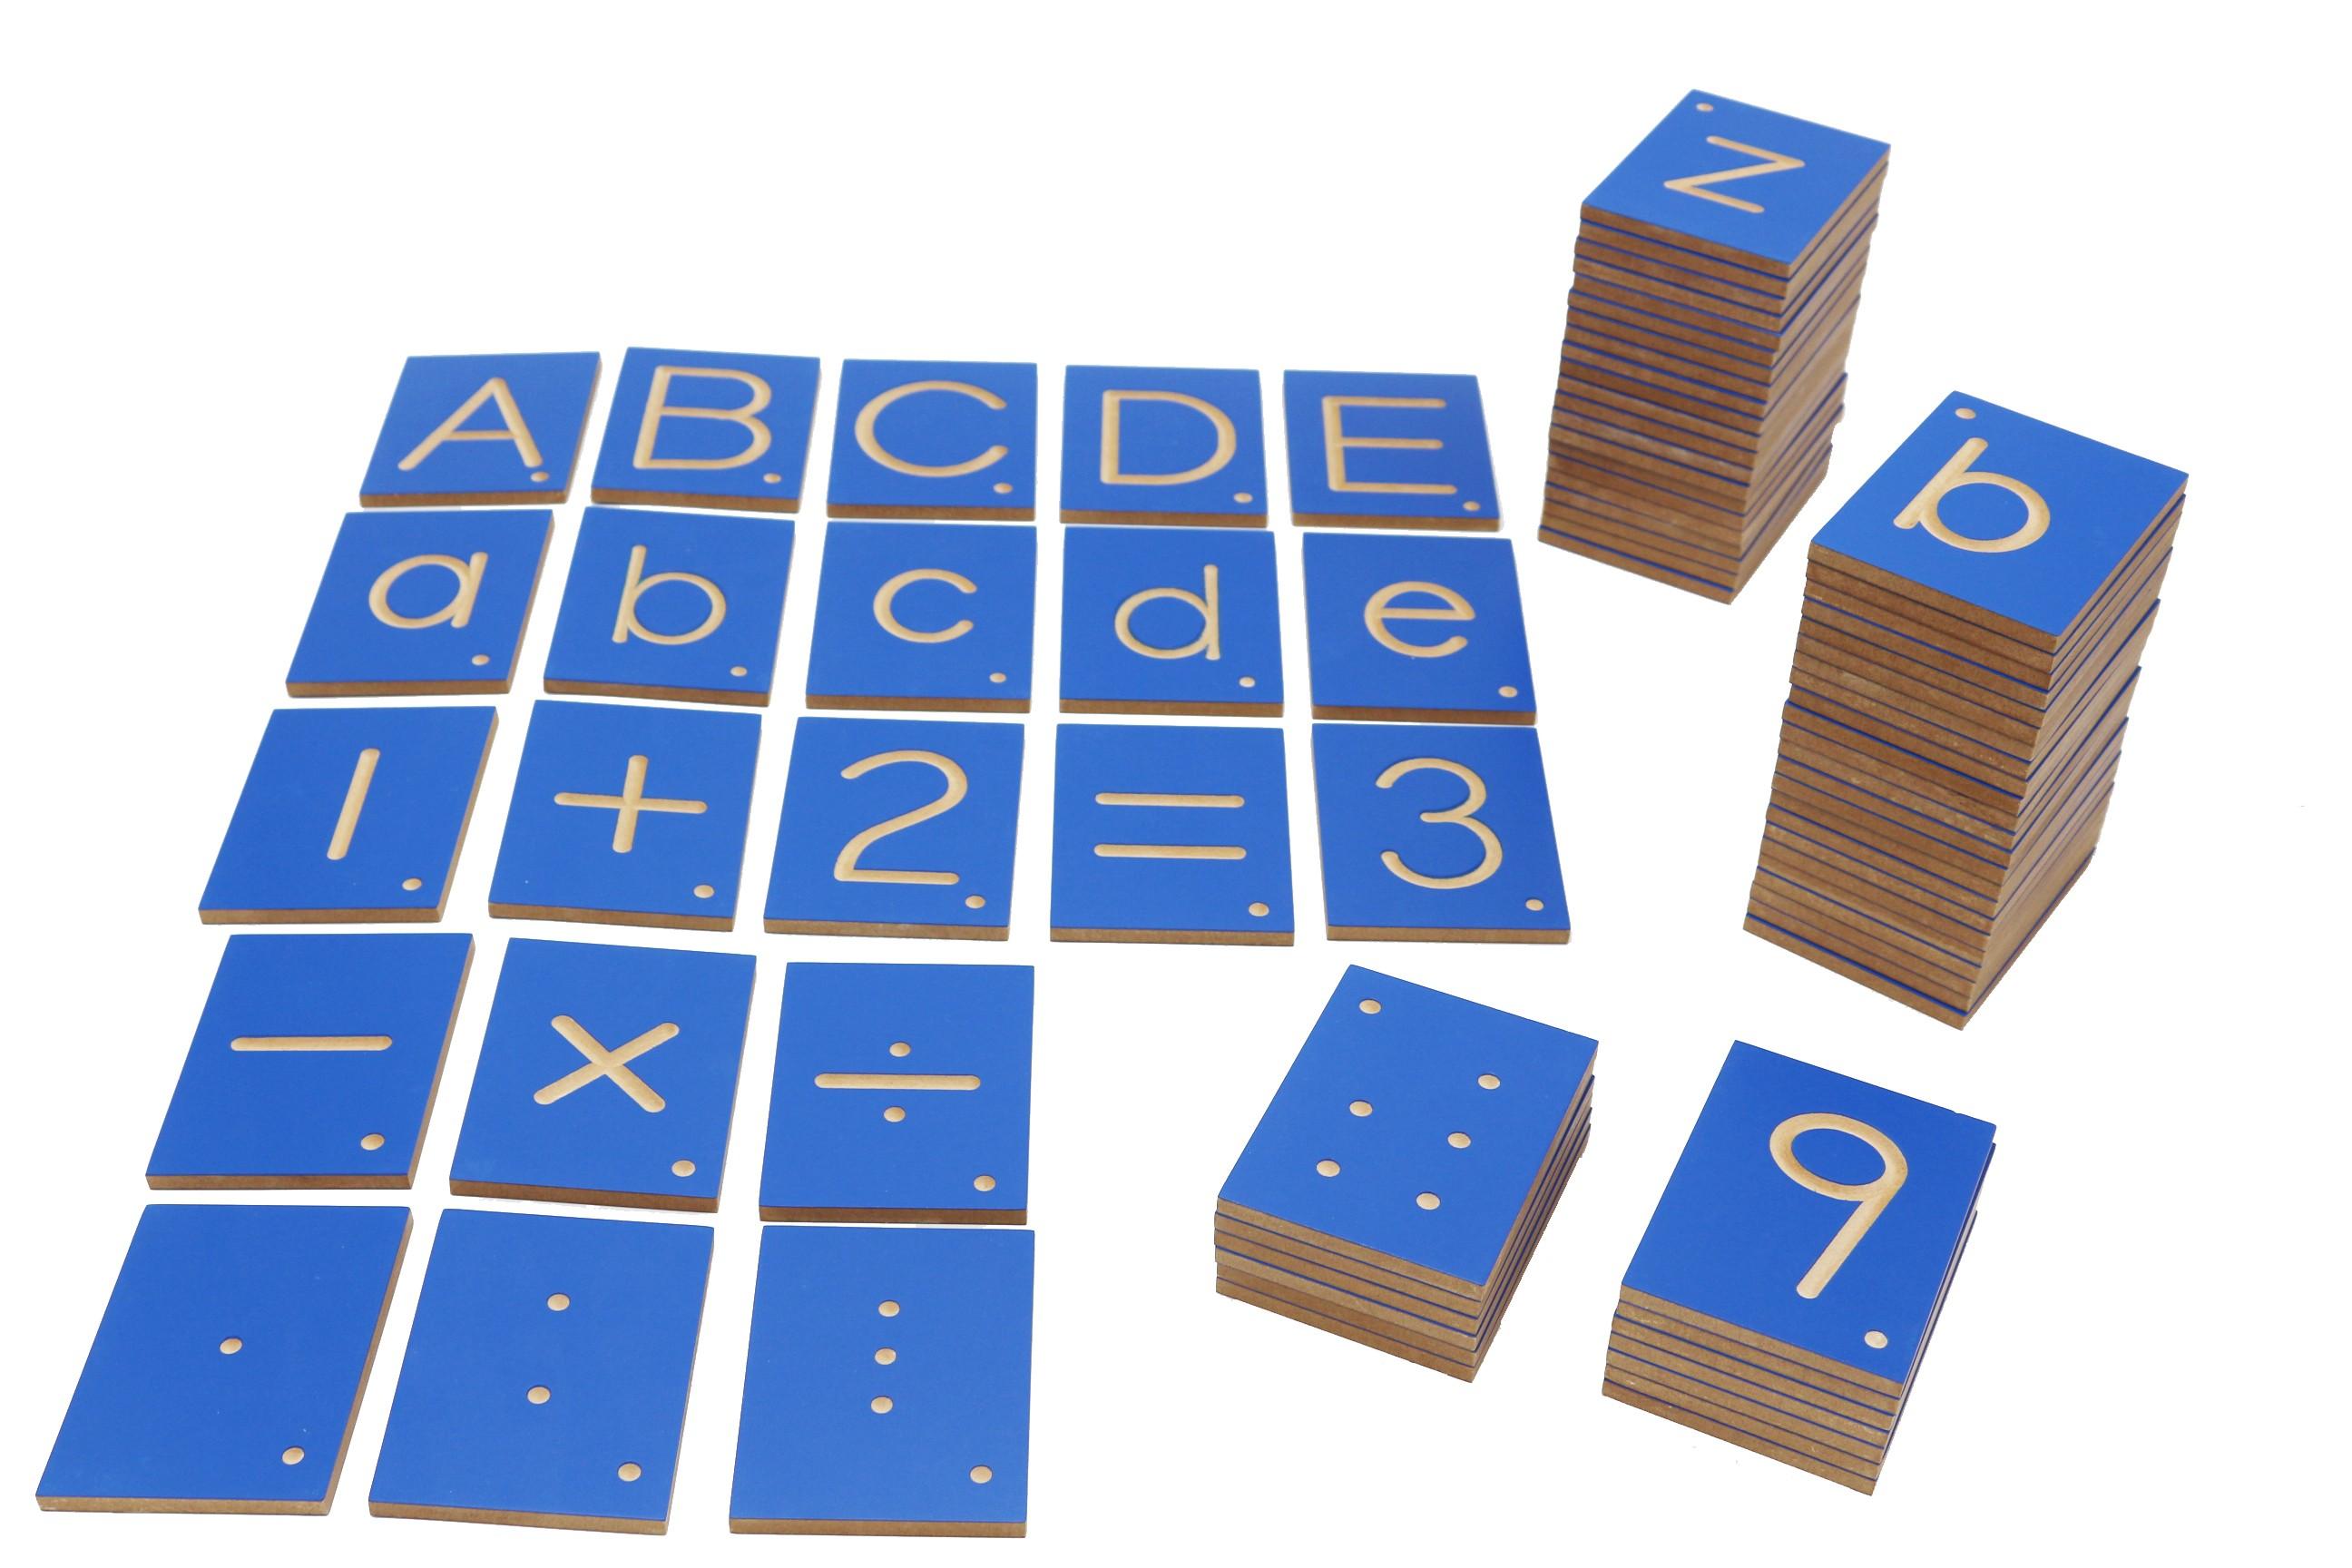 Destičky s čísly a písmeny